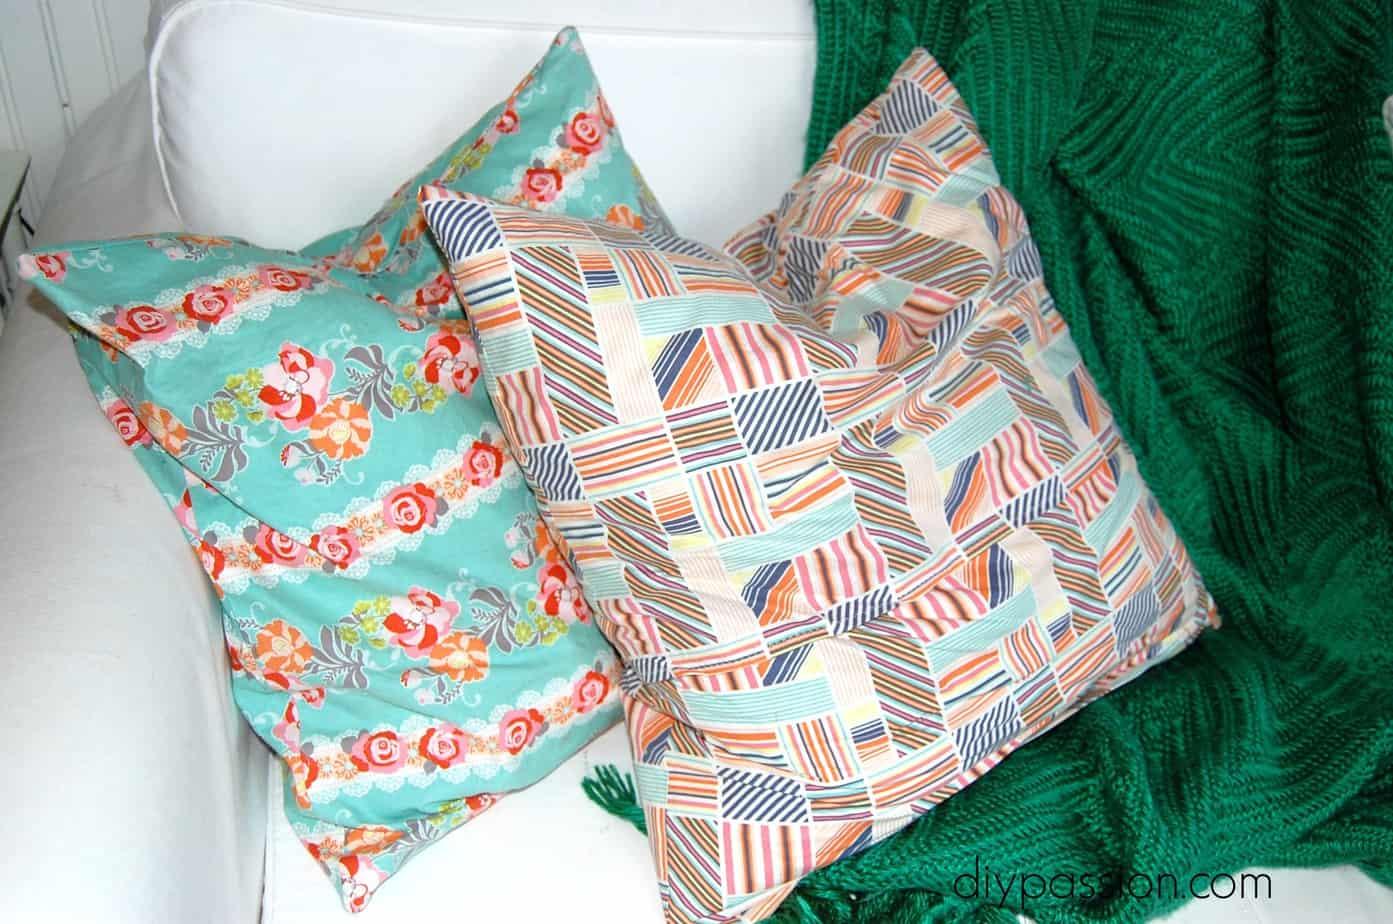 feather pillows 1